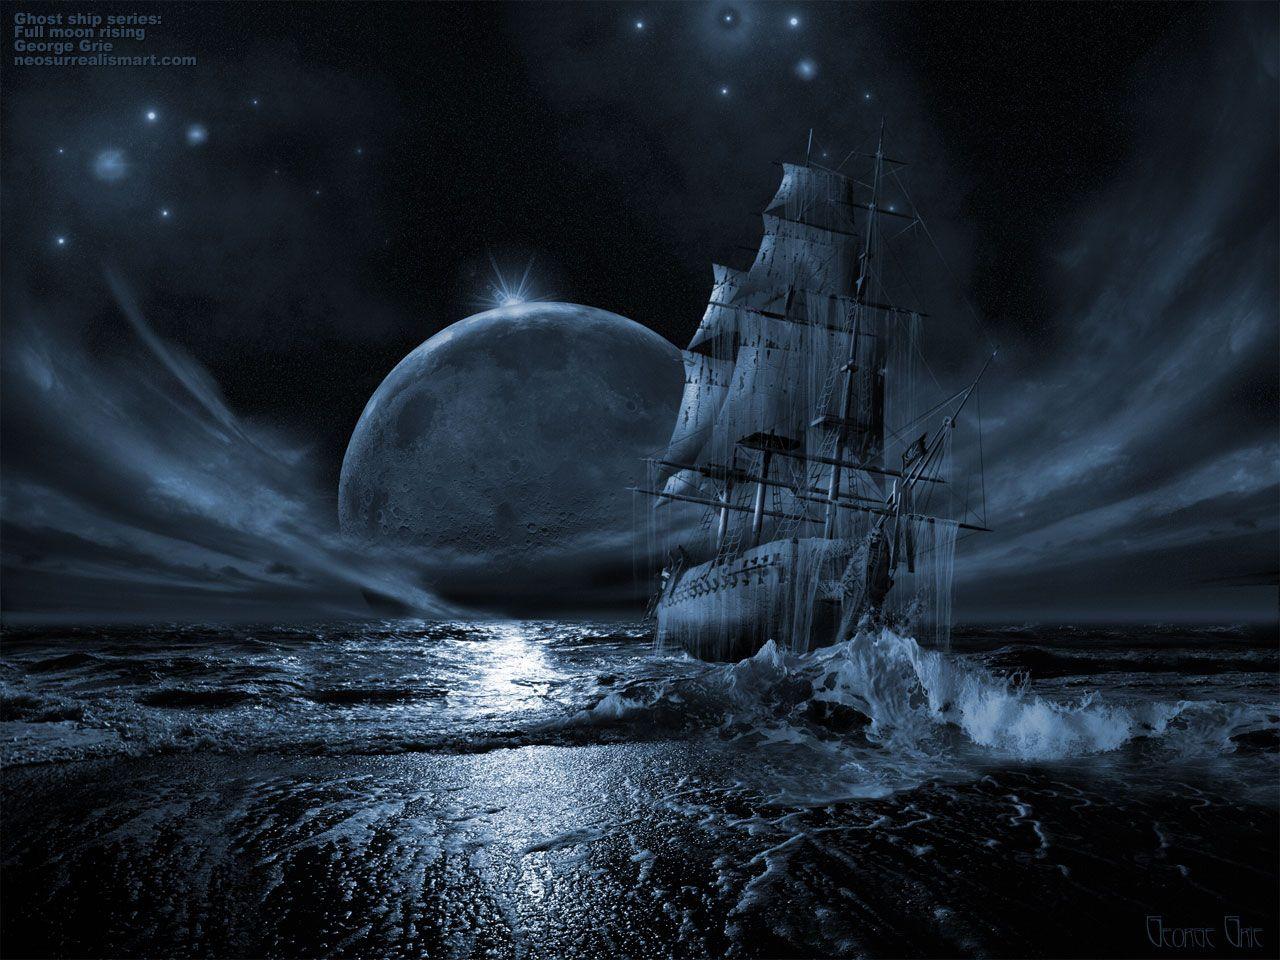 Ghost ship series: Full moon rising